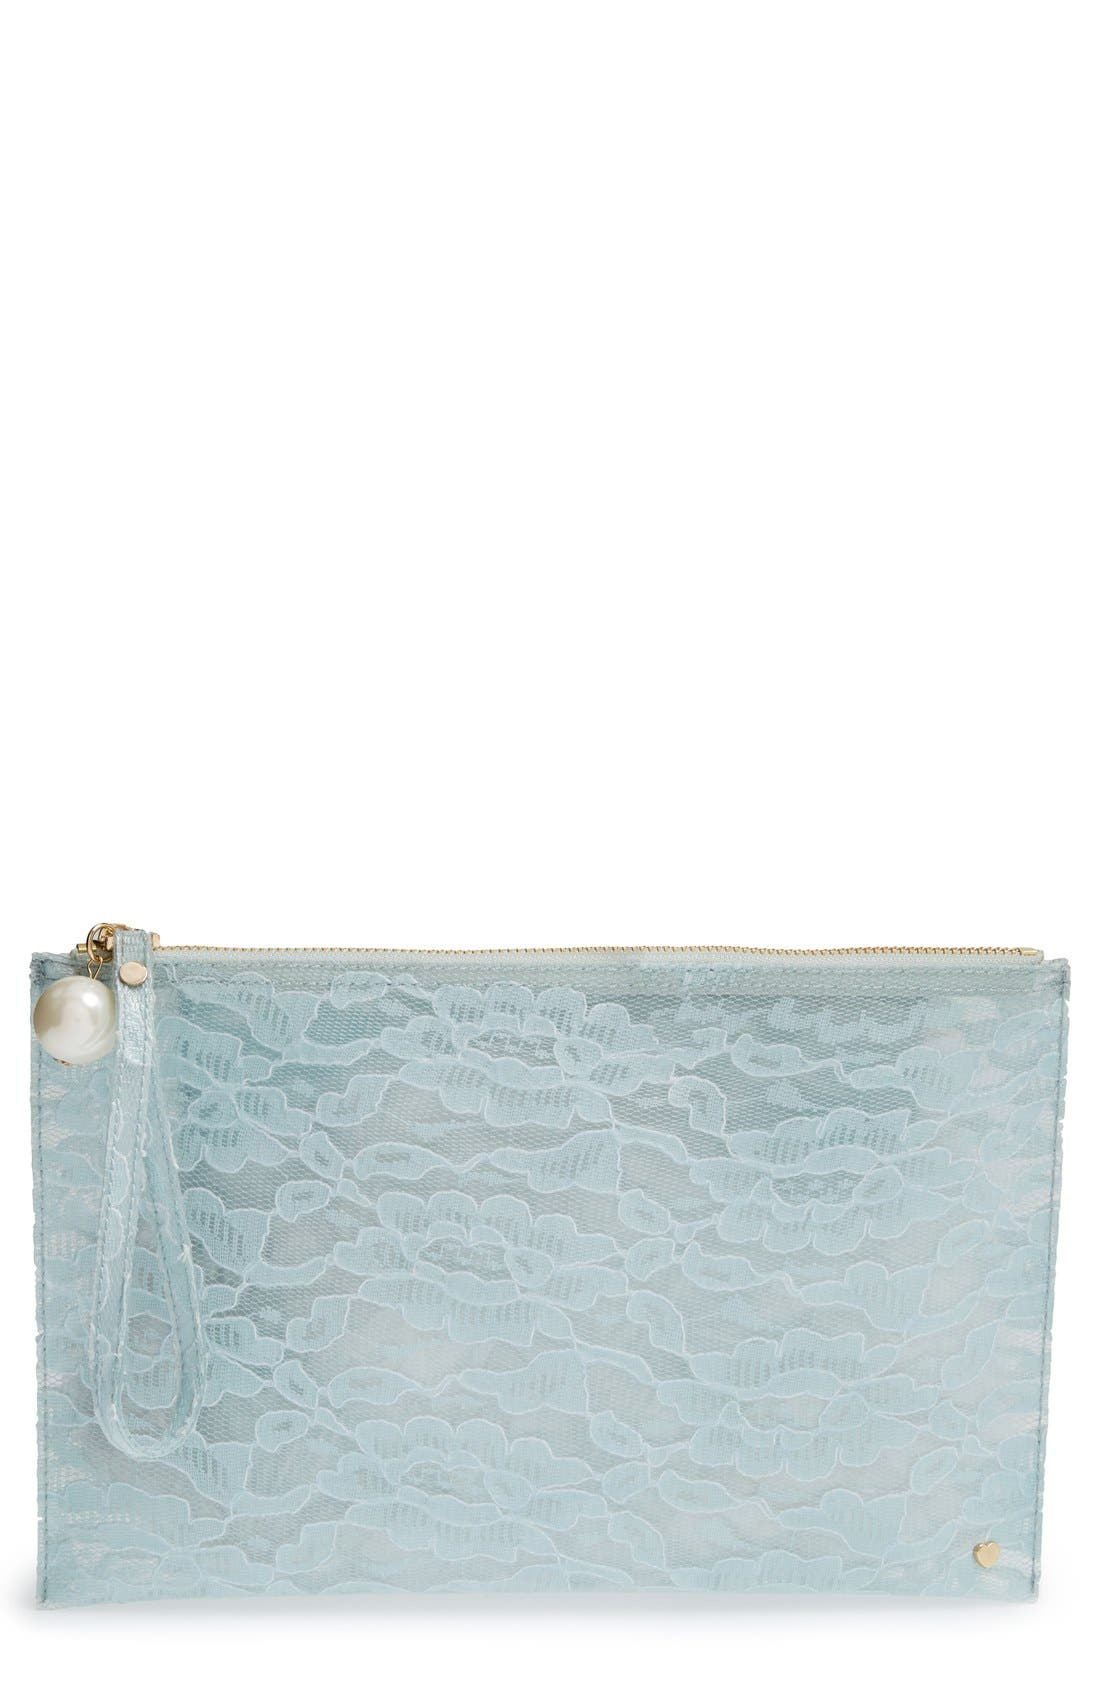 Alternate Image 1 Selected - Deux Lux 'Amour' Transparent Lace Jelly Pouch